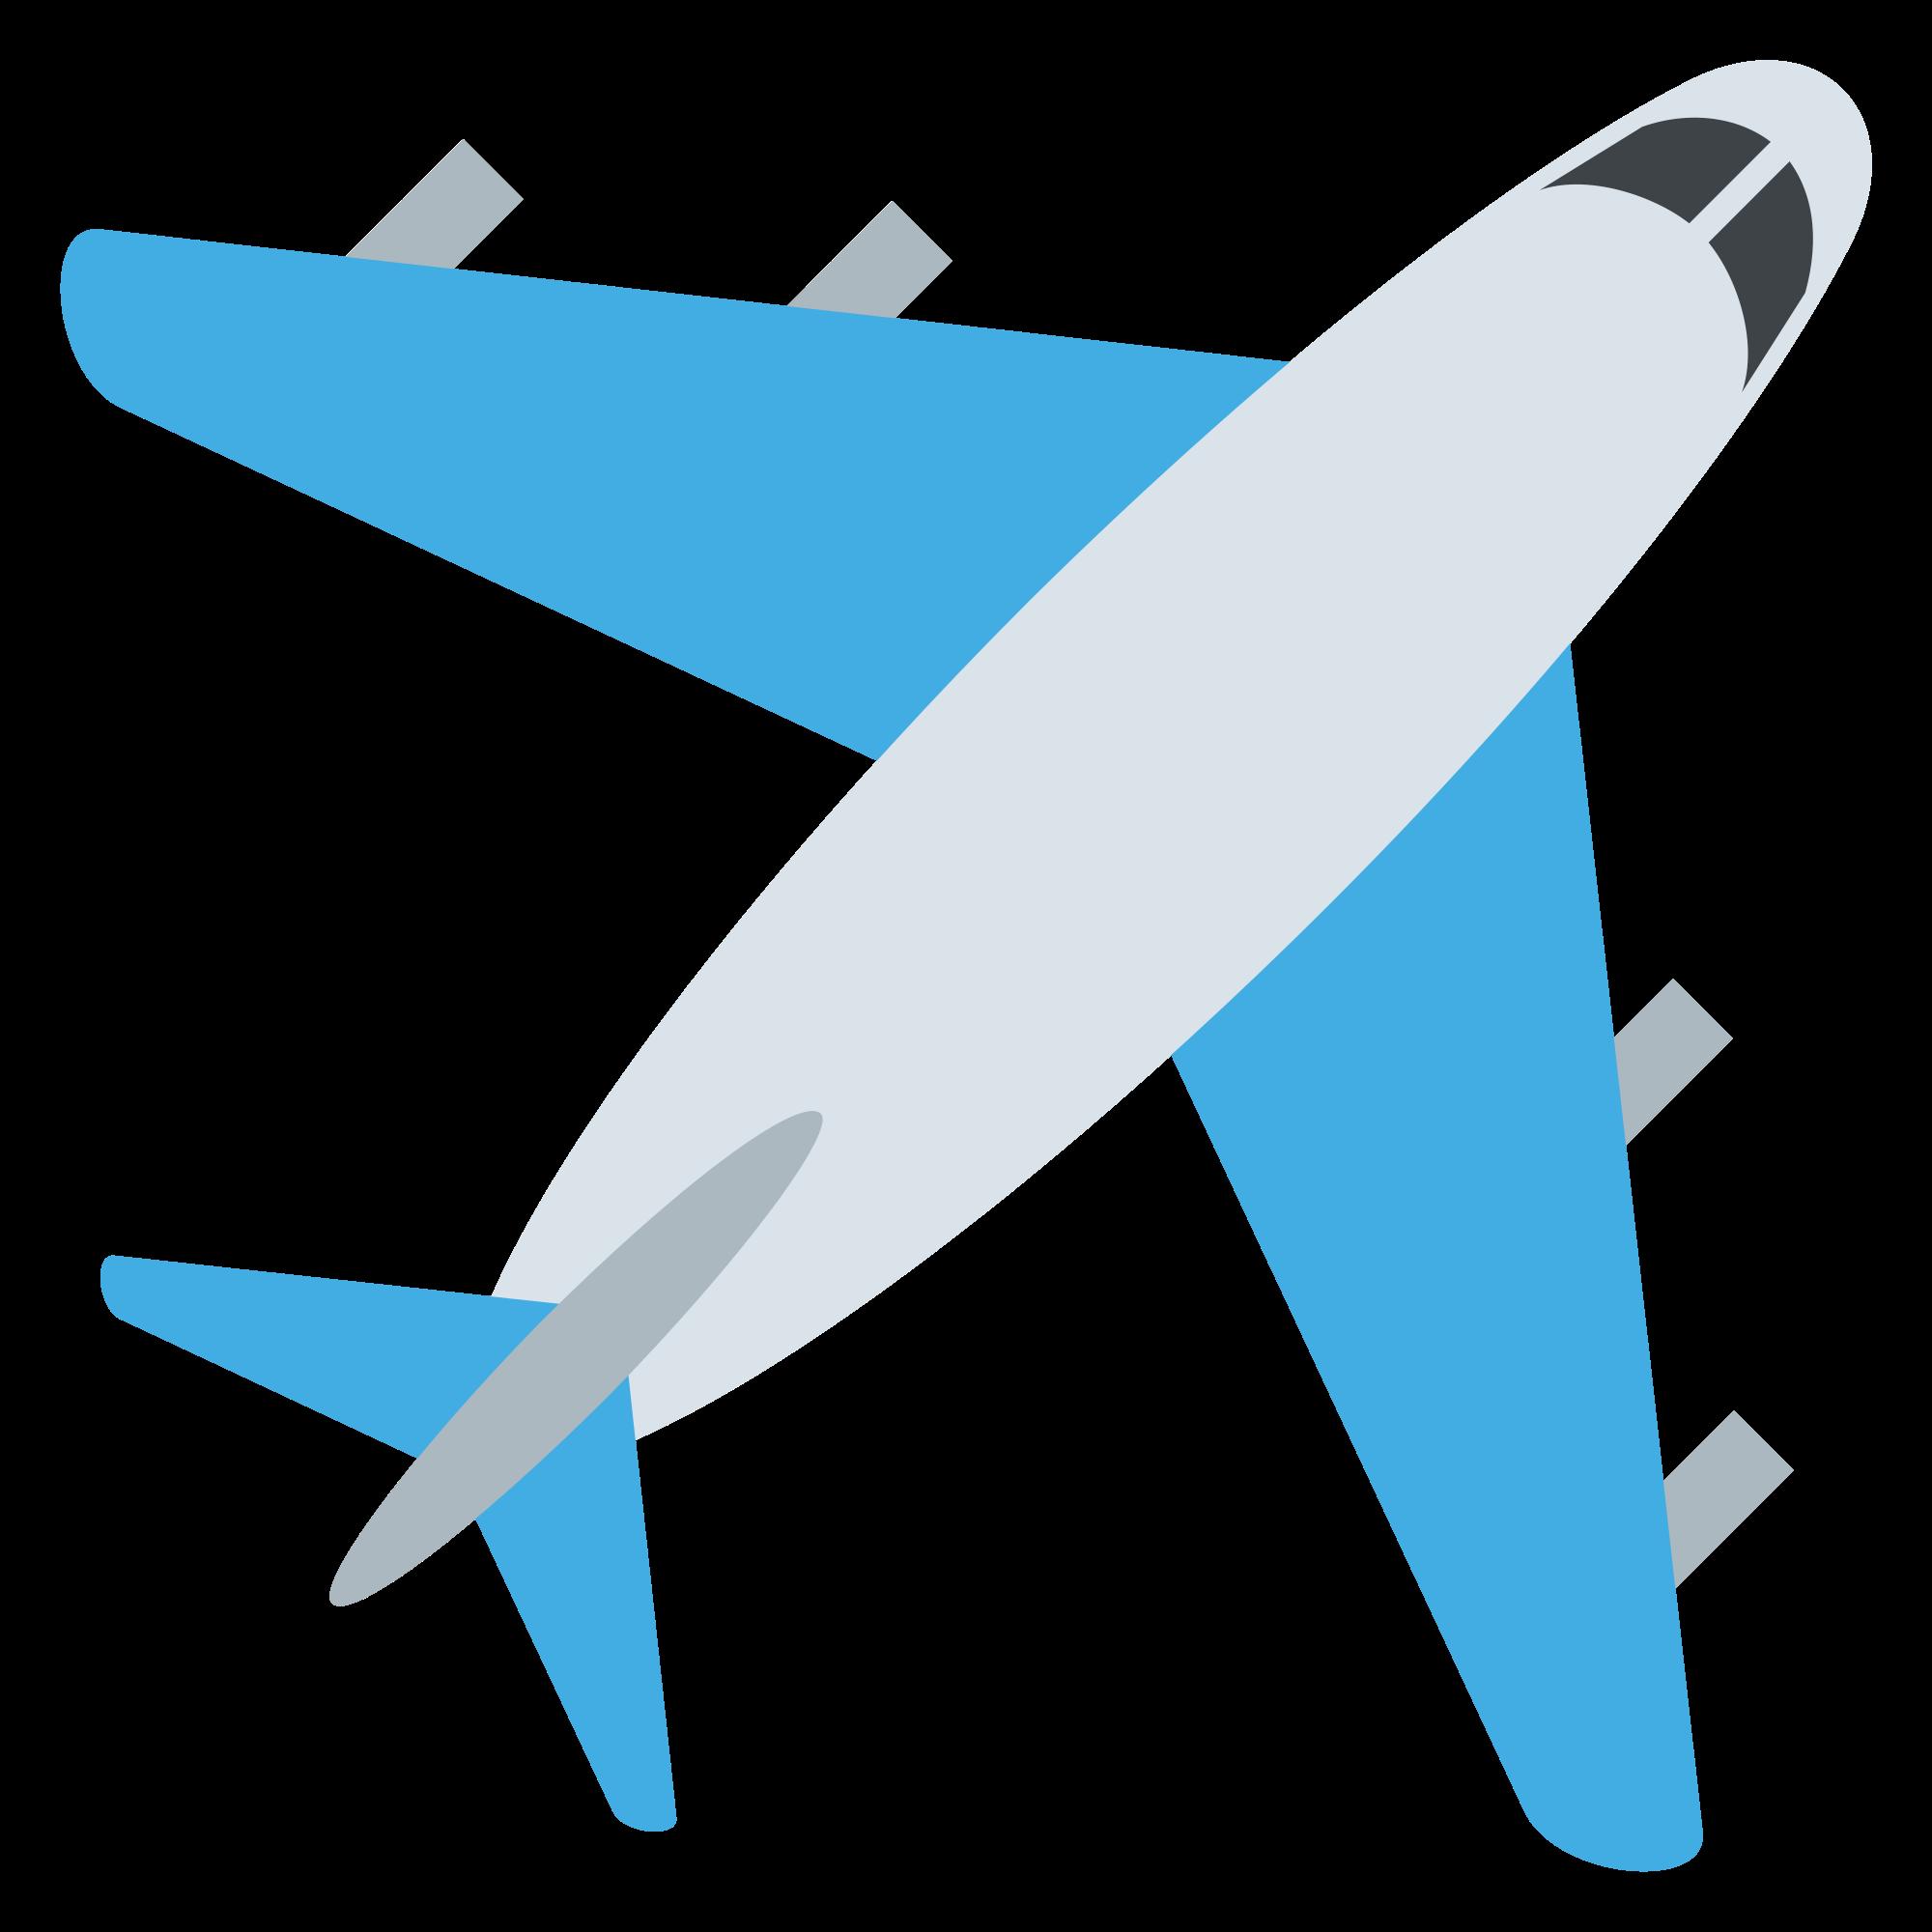 Emoji clipart plane. File emojione svg wikimedia